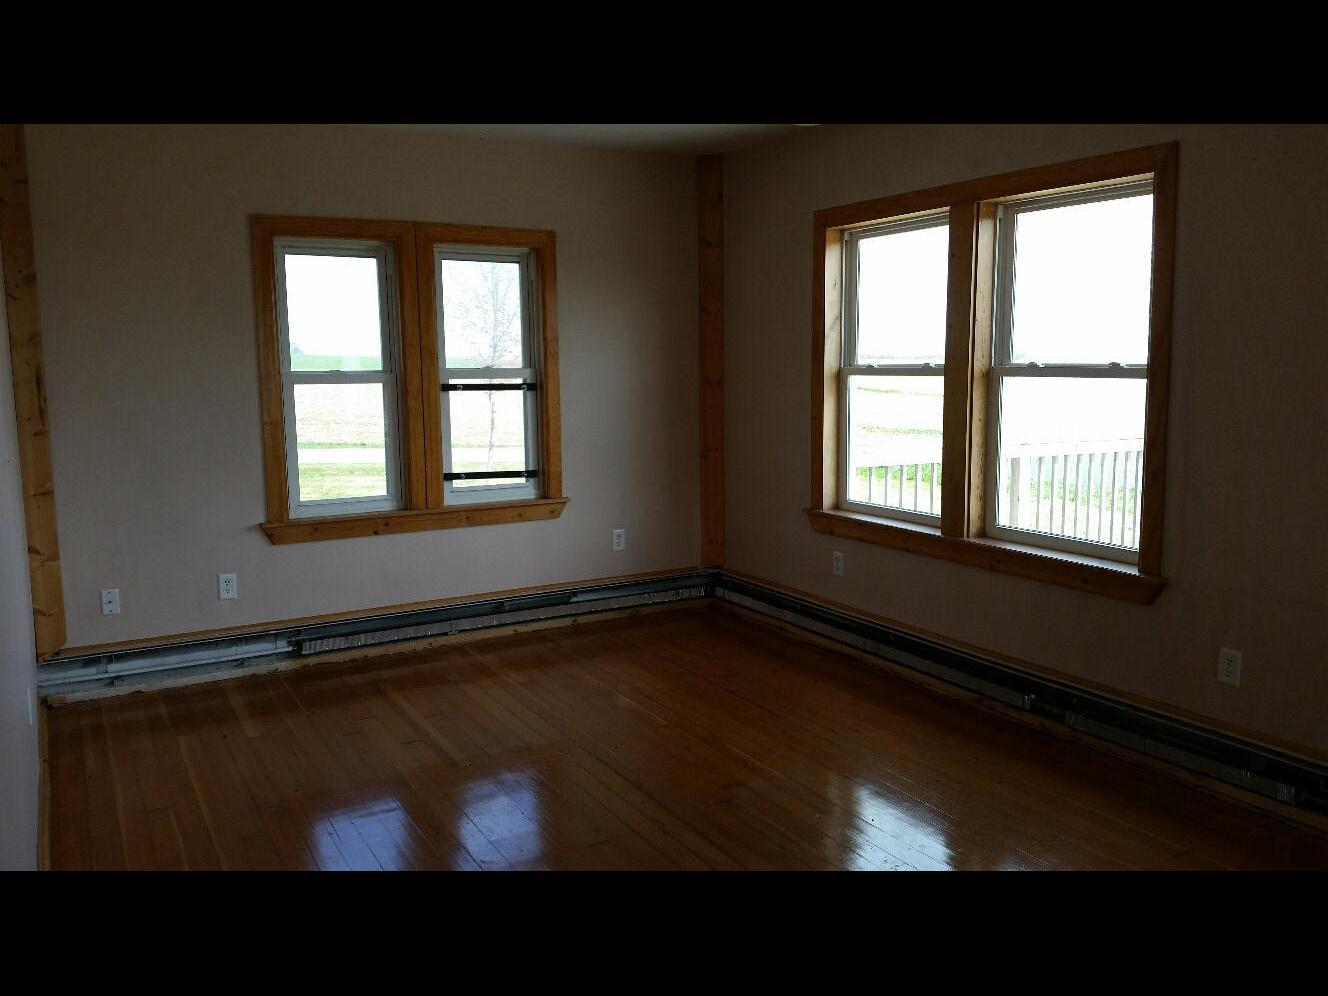 Hannon Living Room